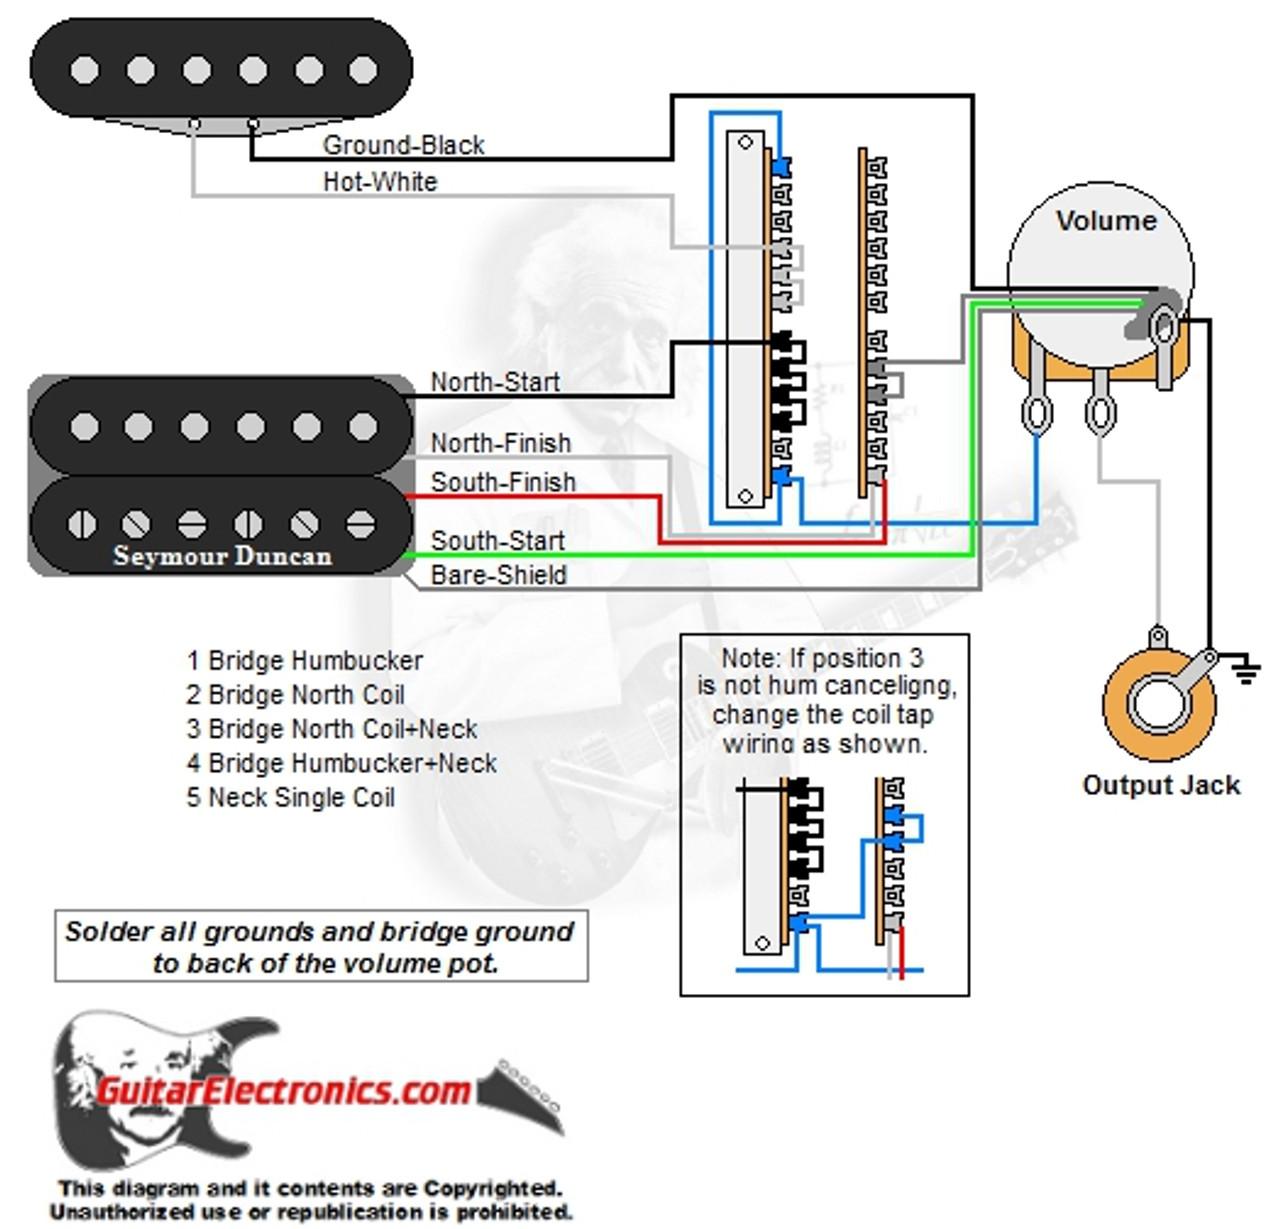 medium resolution of 1 humbucker 1 single coil 5 way lever switch 1 volume 01 wiring diagram for bridge humbucker single coil in neck telecaster